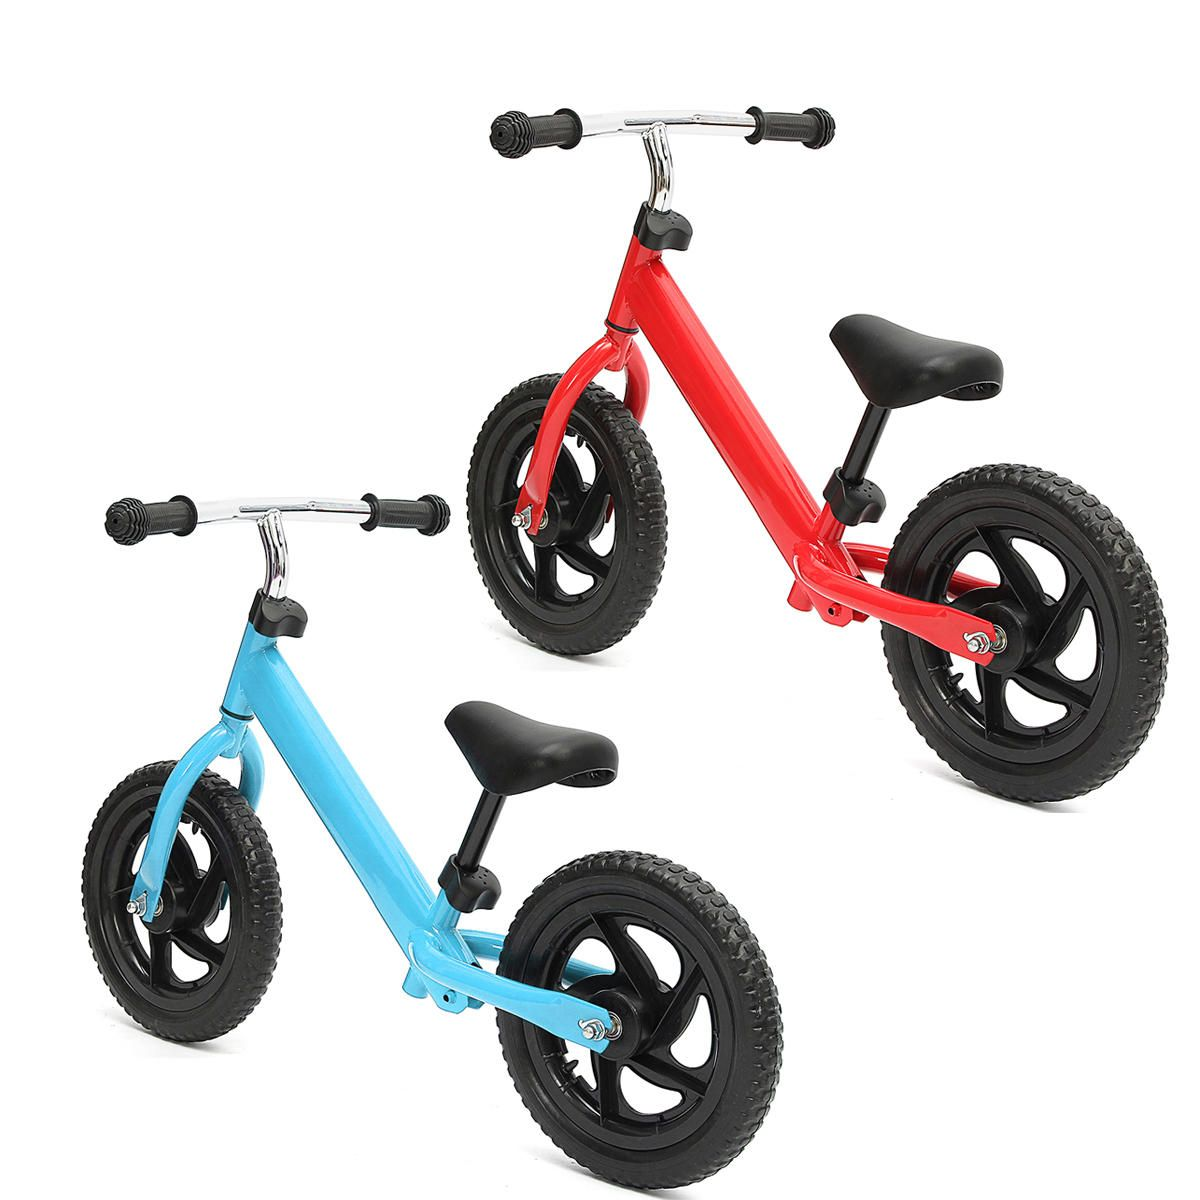 Vvcare Bc Pb01 Children Balance Bike No Pedal Push Bicycle Kids